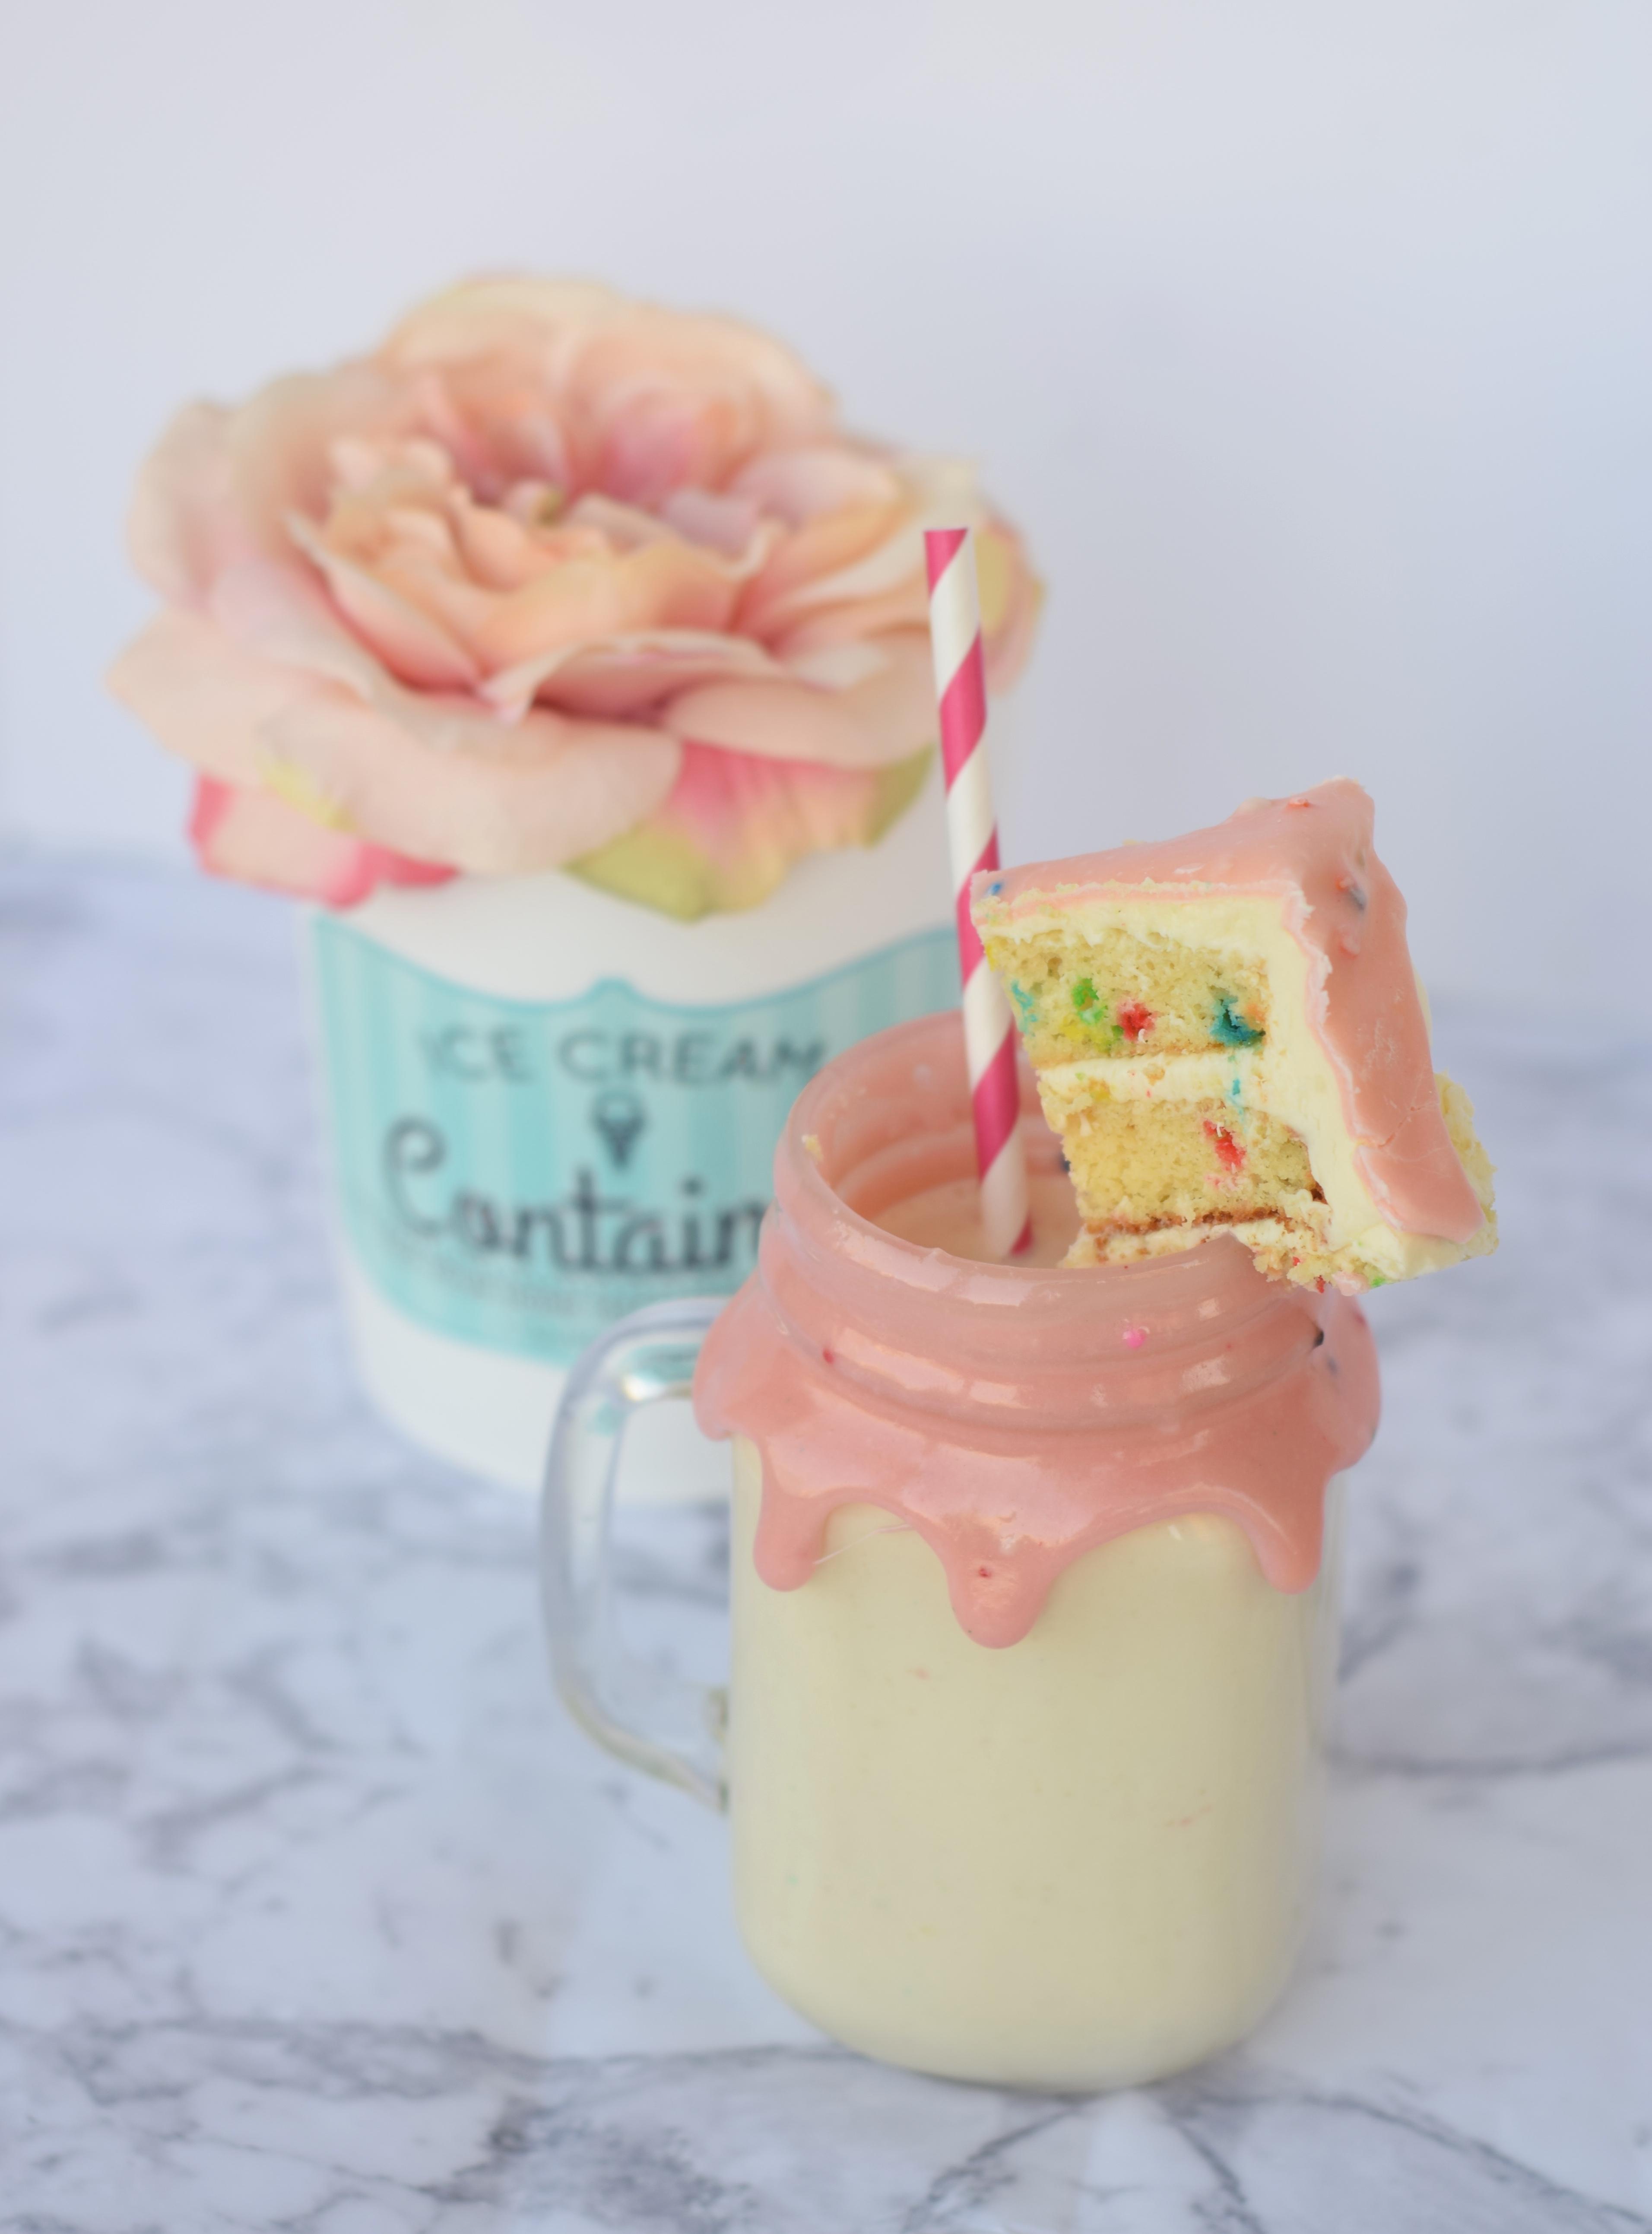 3 Ingredient Easy Cakeshake Milkshake Recipe